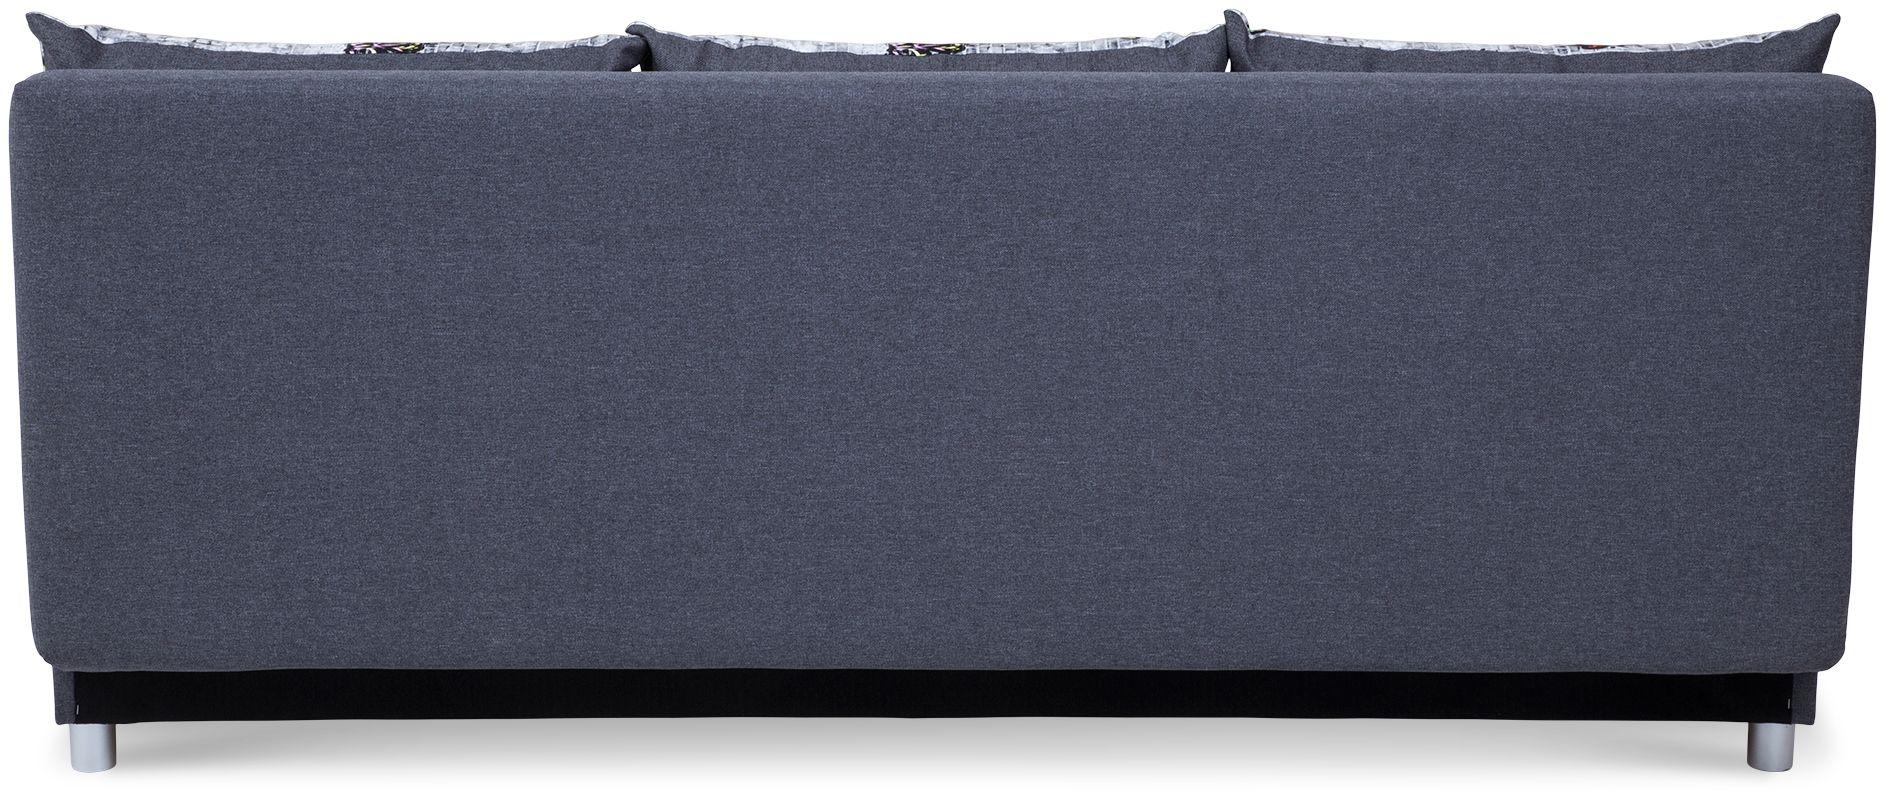 sofa aria 1  3